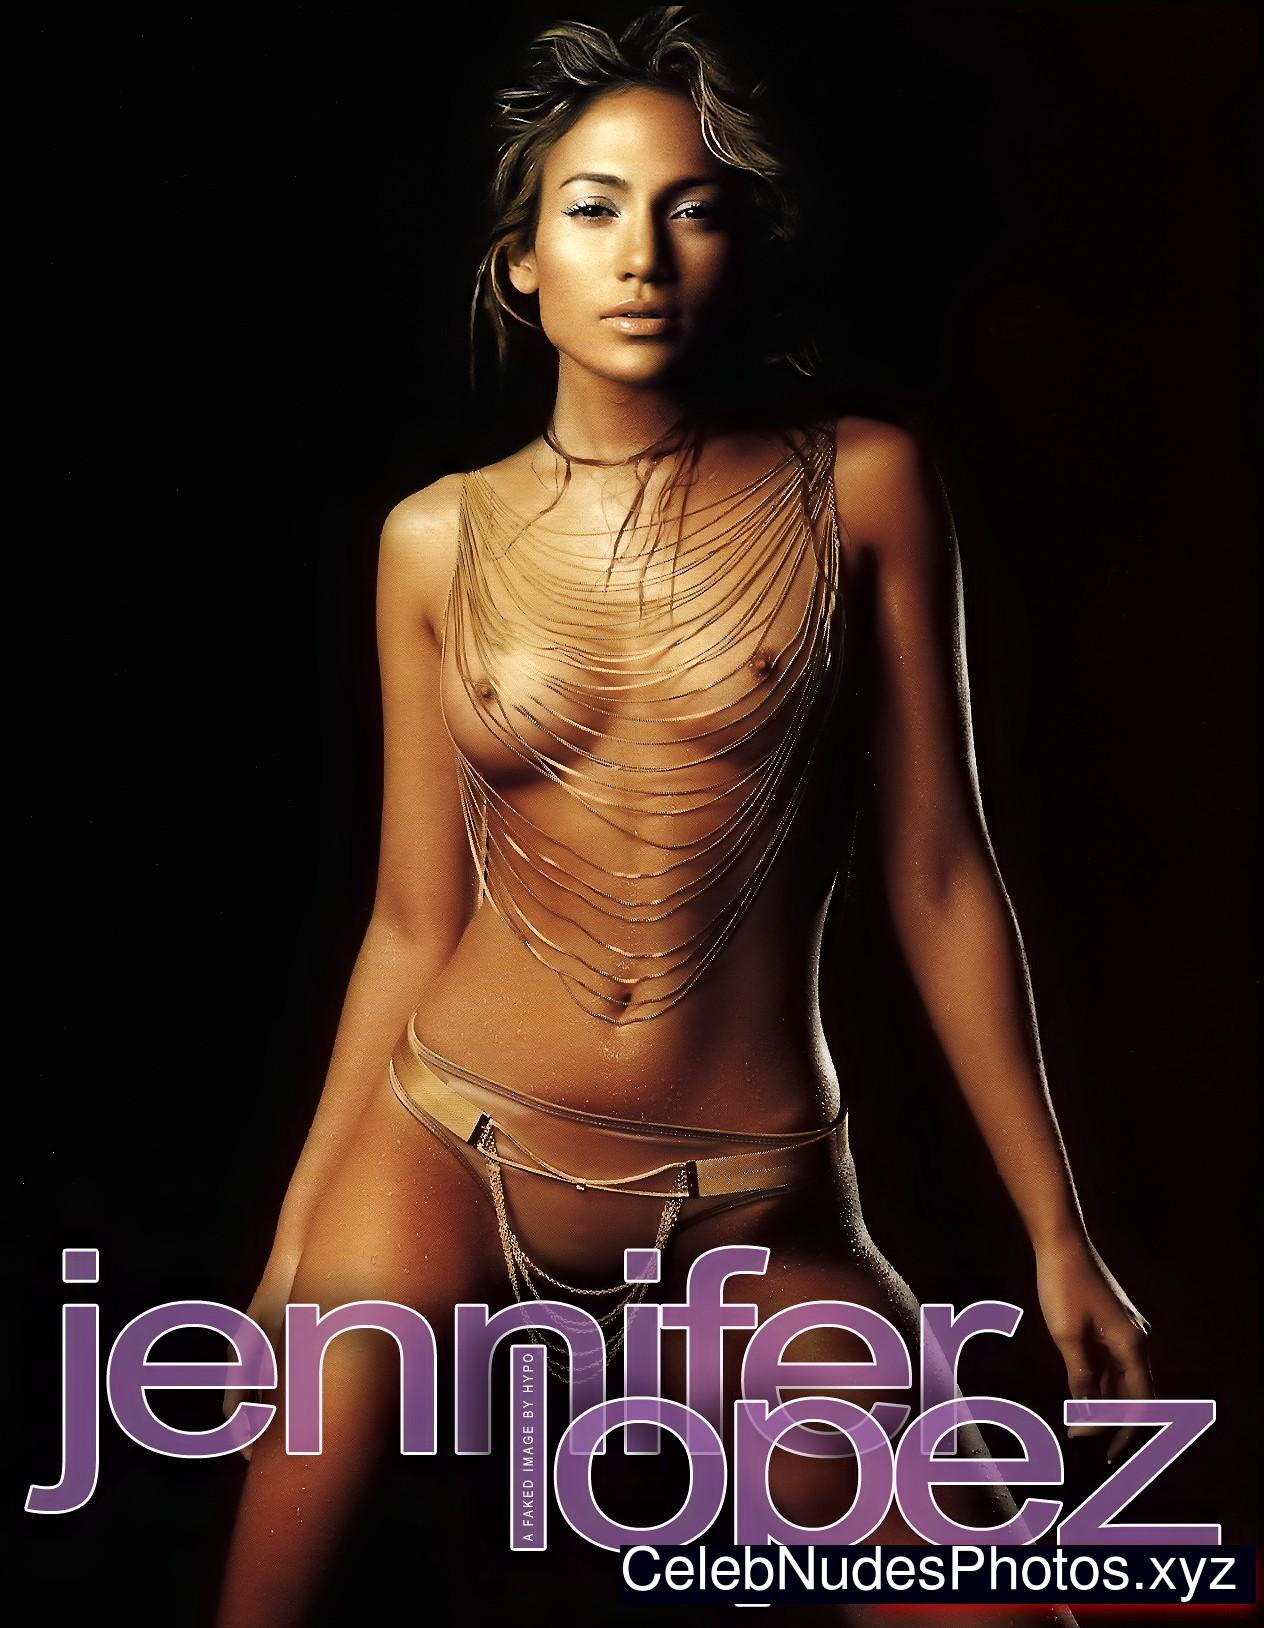 jennifer lopez stripping nude